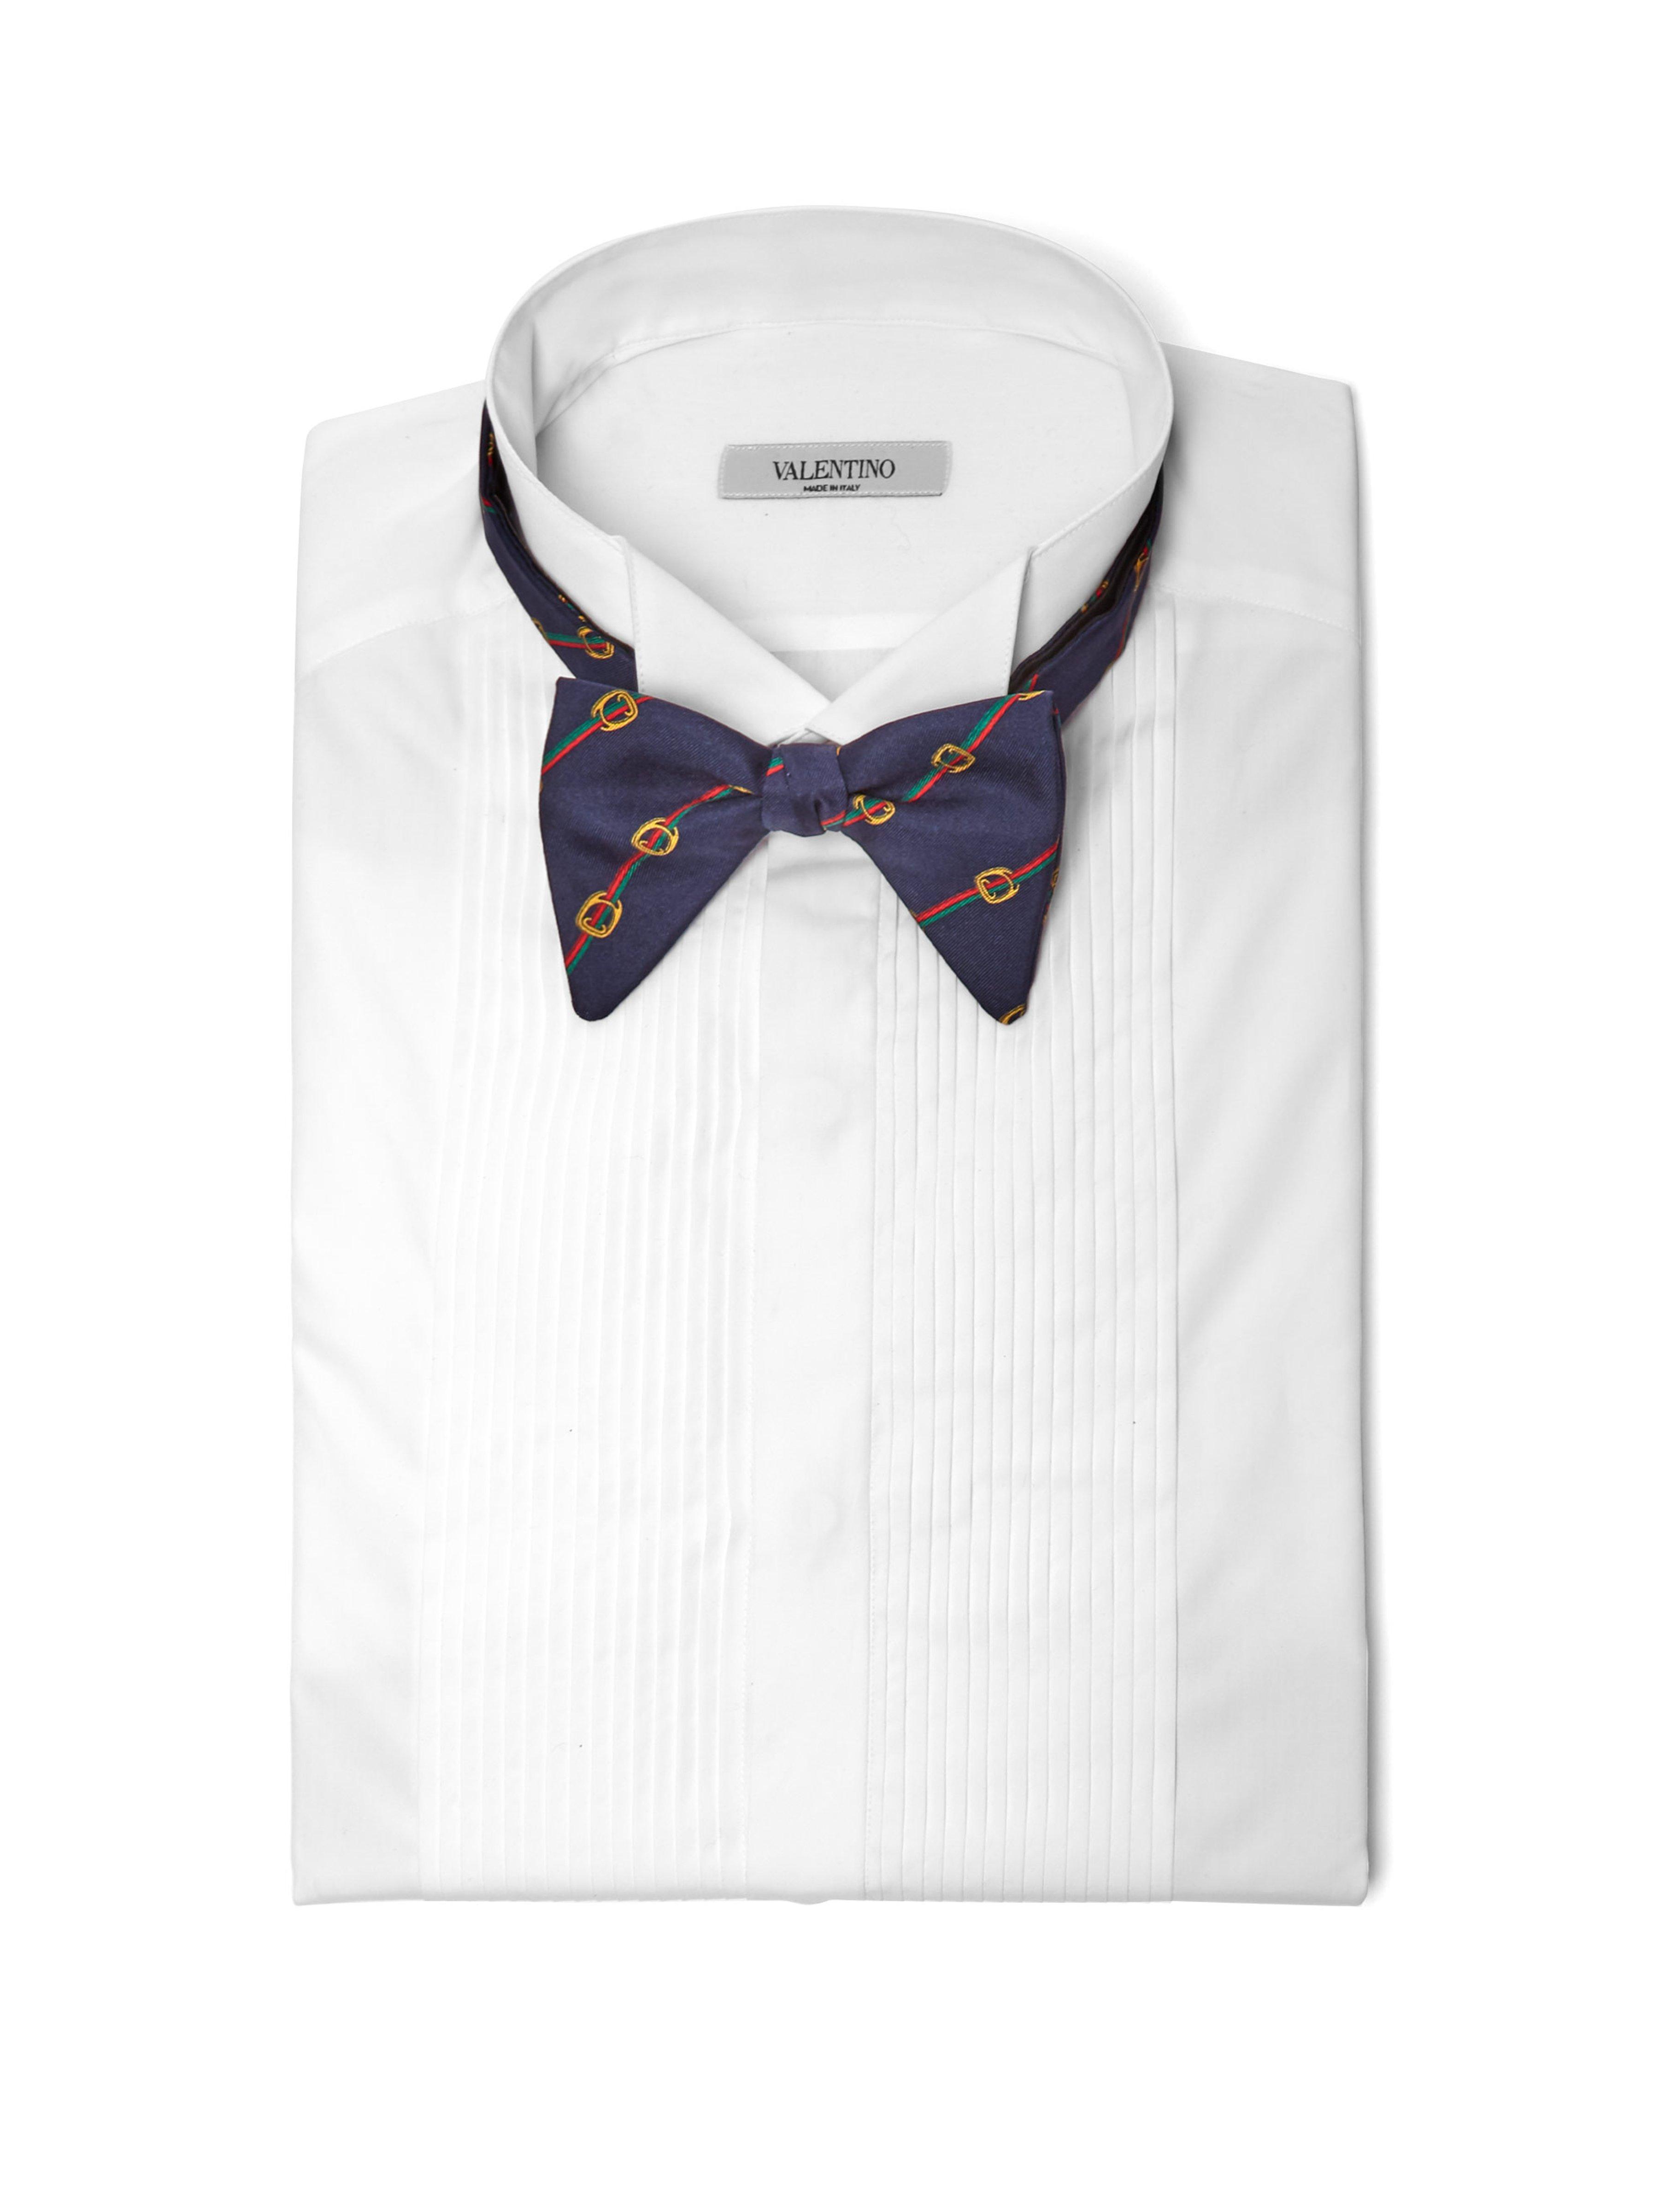 a5369bc6095 Gucci Horsebit Print Silk Twill Bow Tie in Blue for Men - Lyst